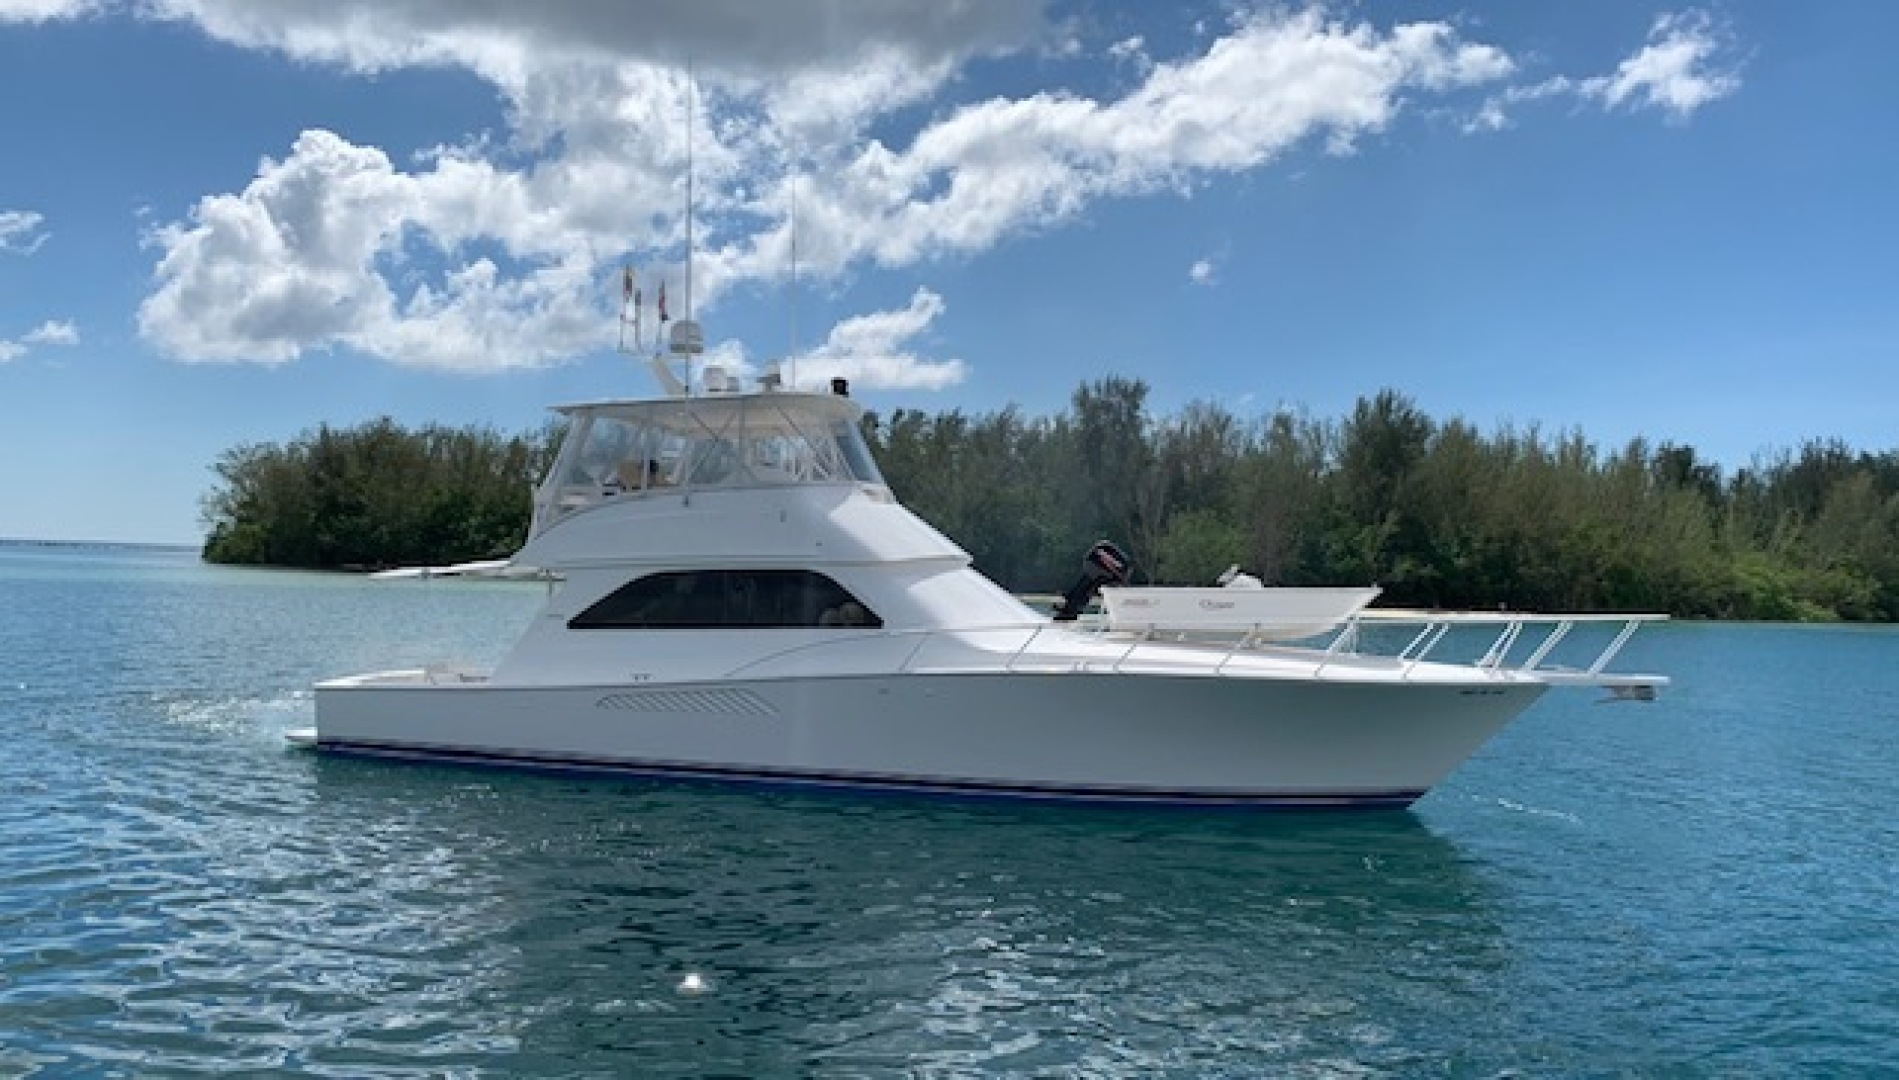 Viking-Convertible 2003-Ayayaiii Fort Lauderdale-Florida-United States-Starboard Profile-1544407 | Thumbnail